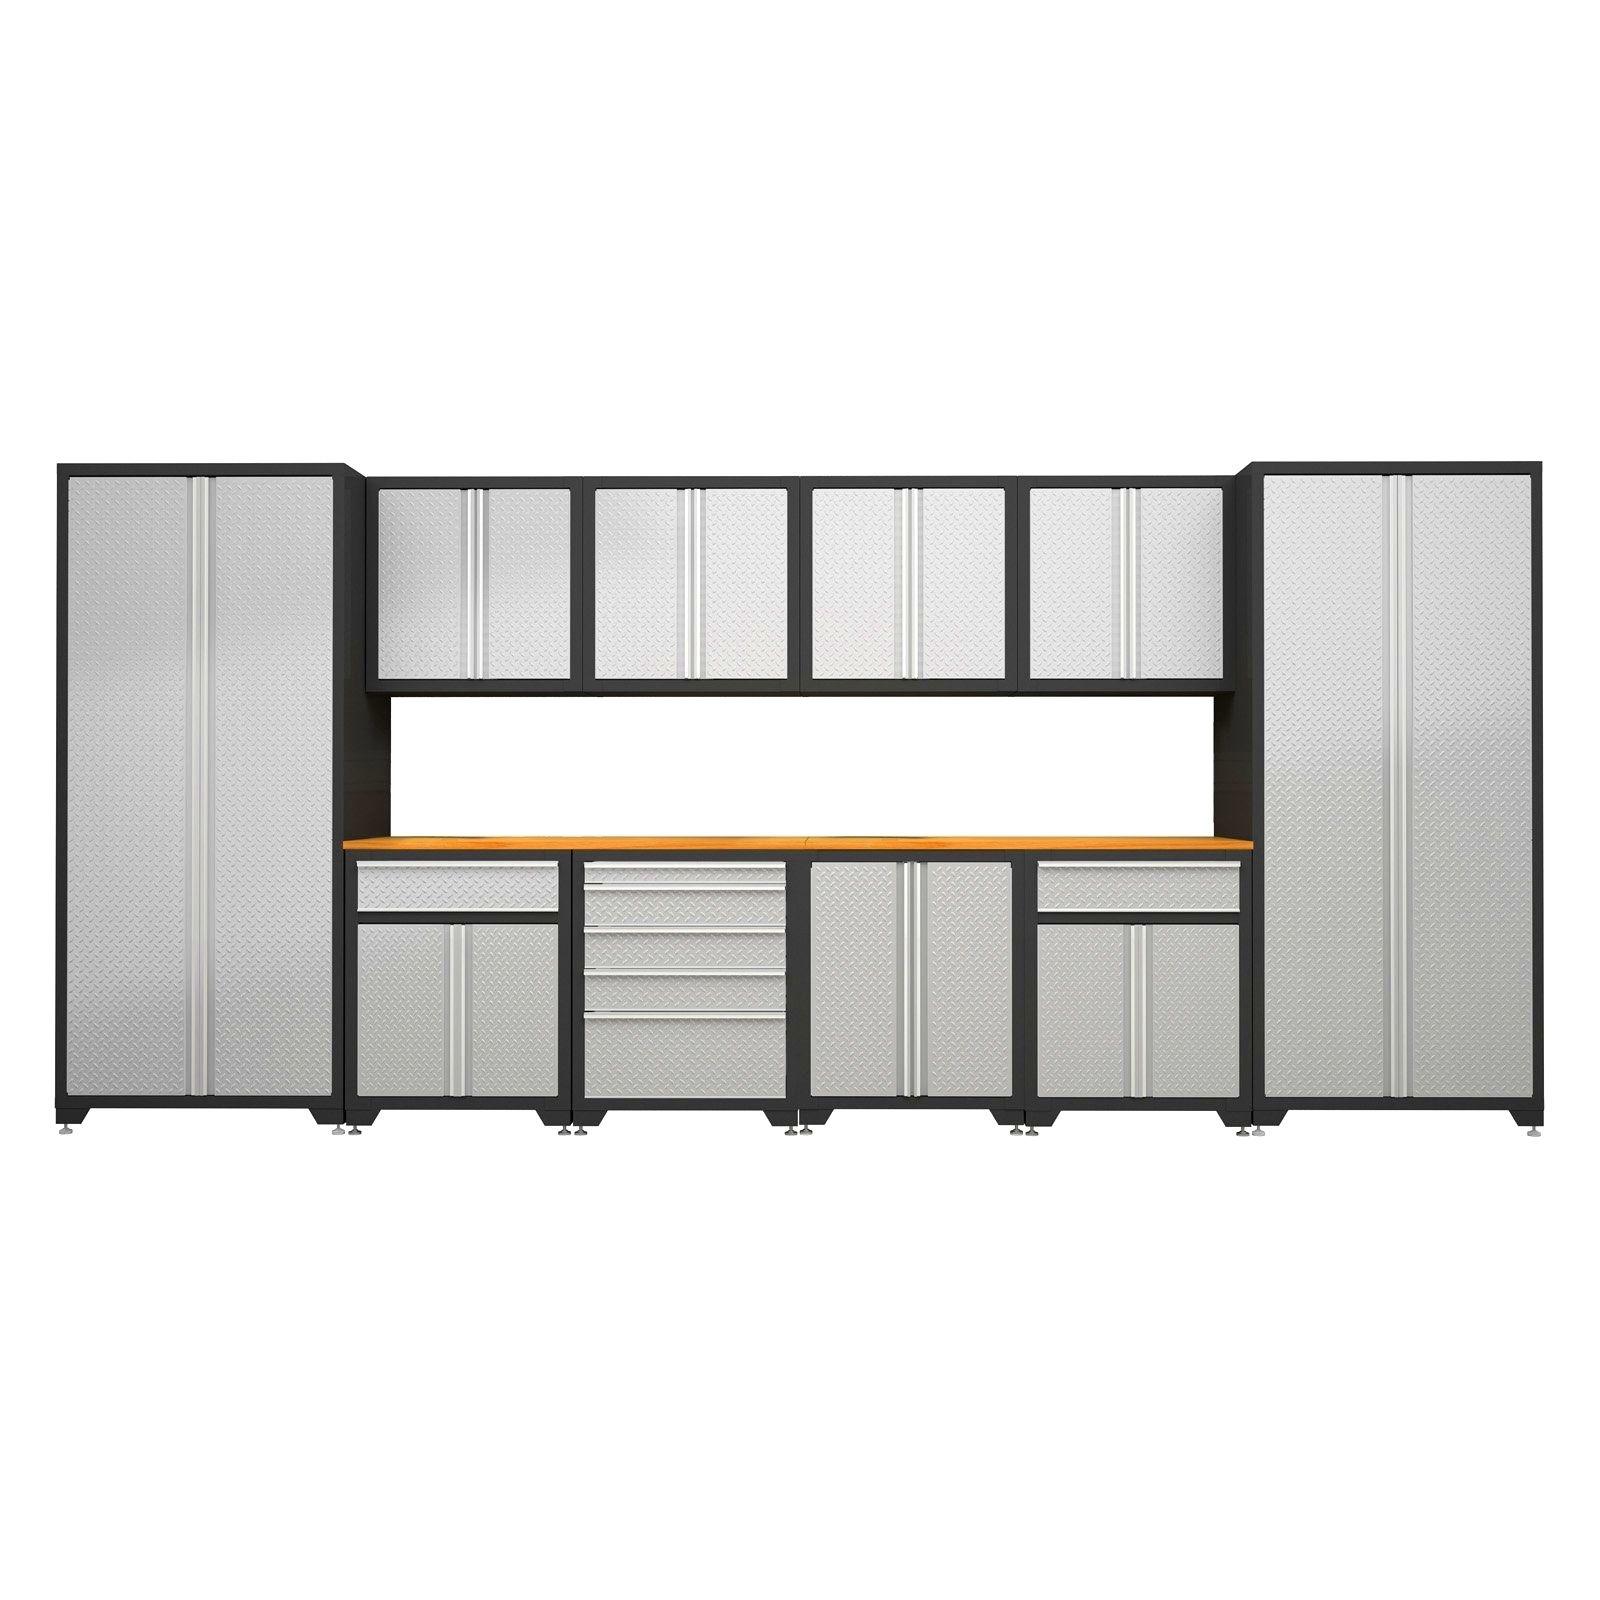 Aluminum Diamond Plate Storage Cabinets